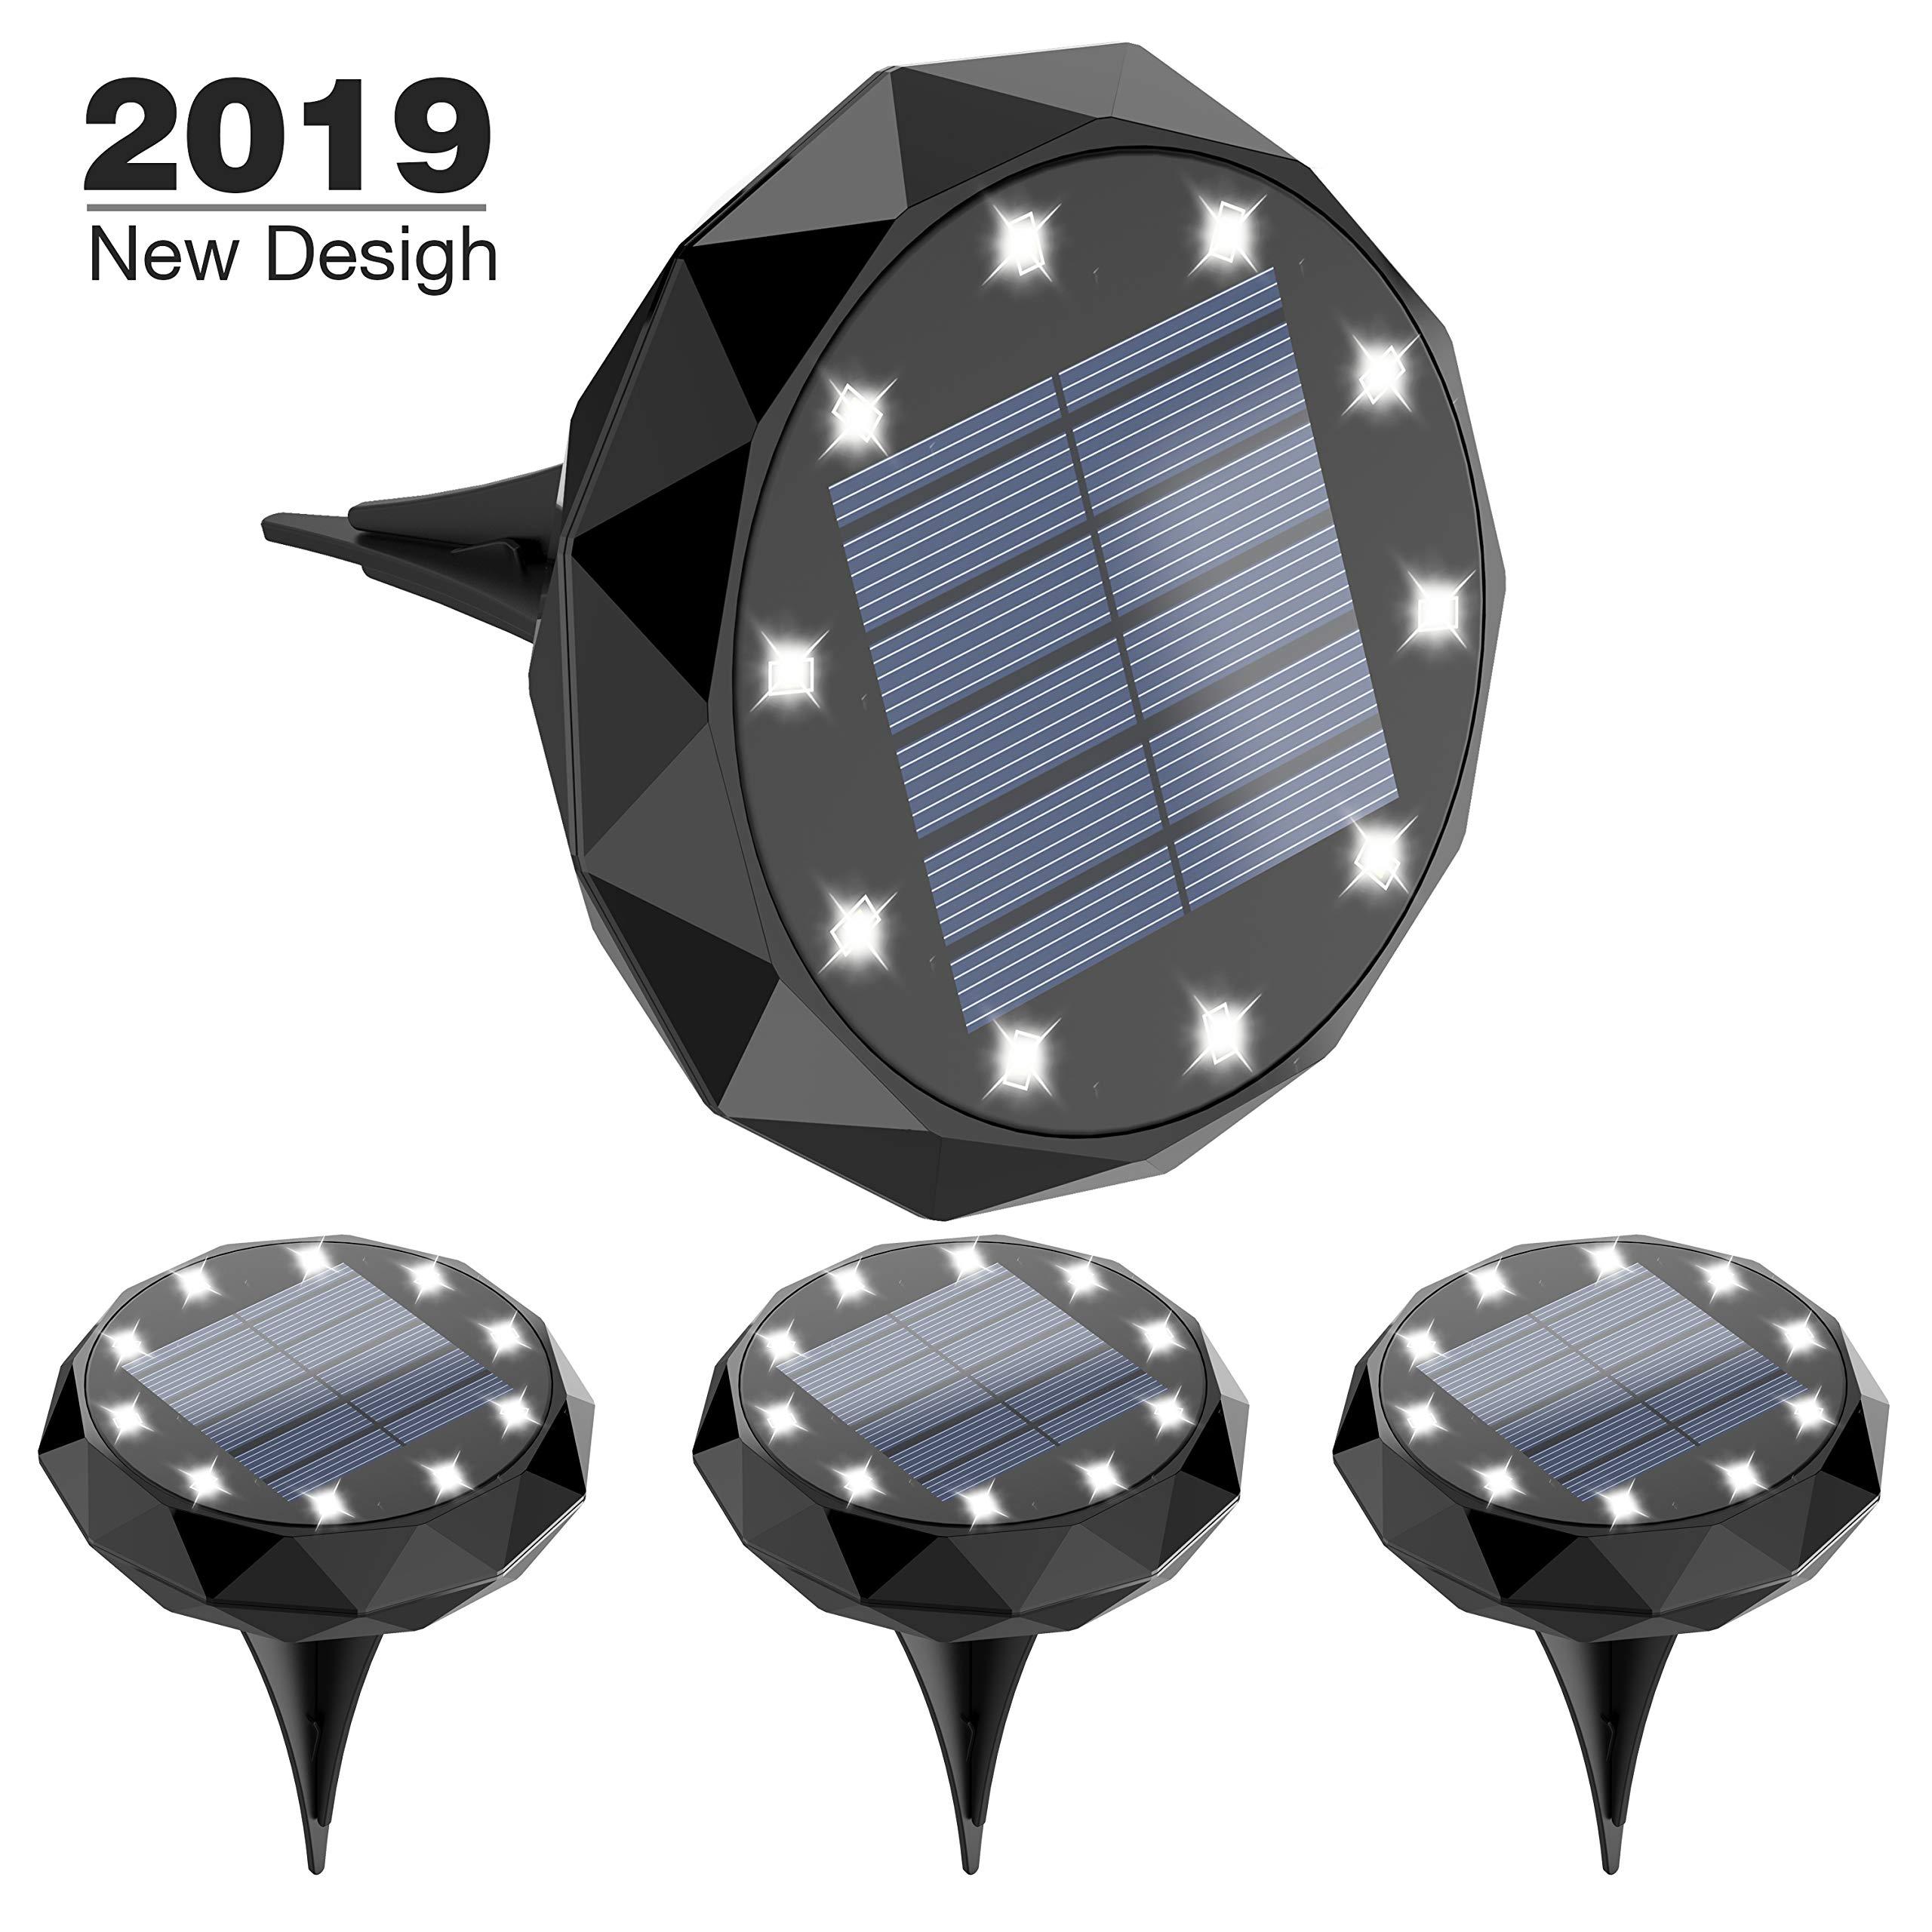 Leknes Solar Ground Lights,Upgrade 10 LED Solar Powered Solar Garden Lights Solar Disk Lights Outdoor Waterproof Solar Landscape Lighting Auto on/Off with Sensor for Patio Pathway Garden Lawn Yard